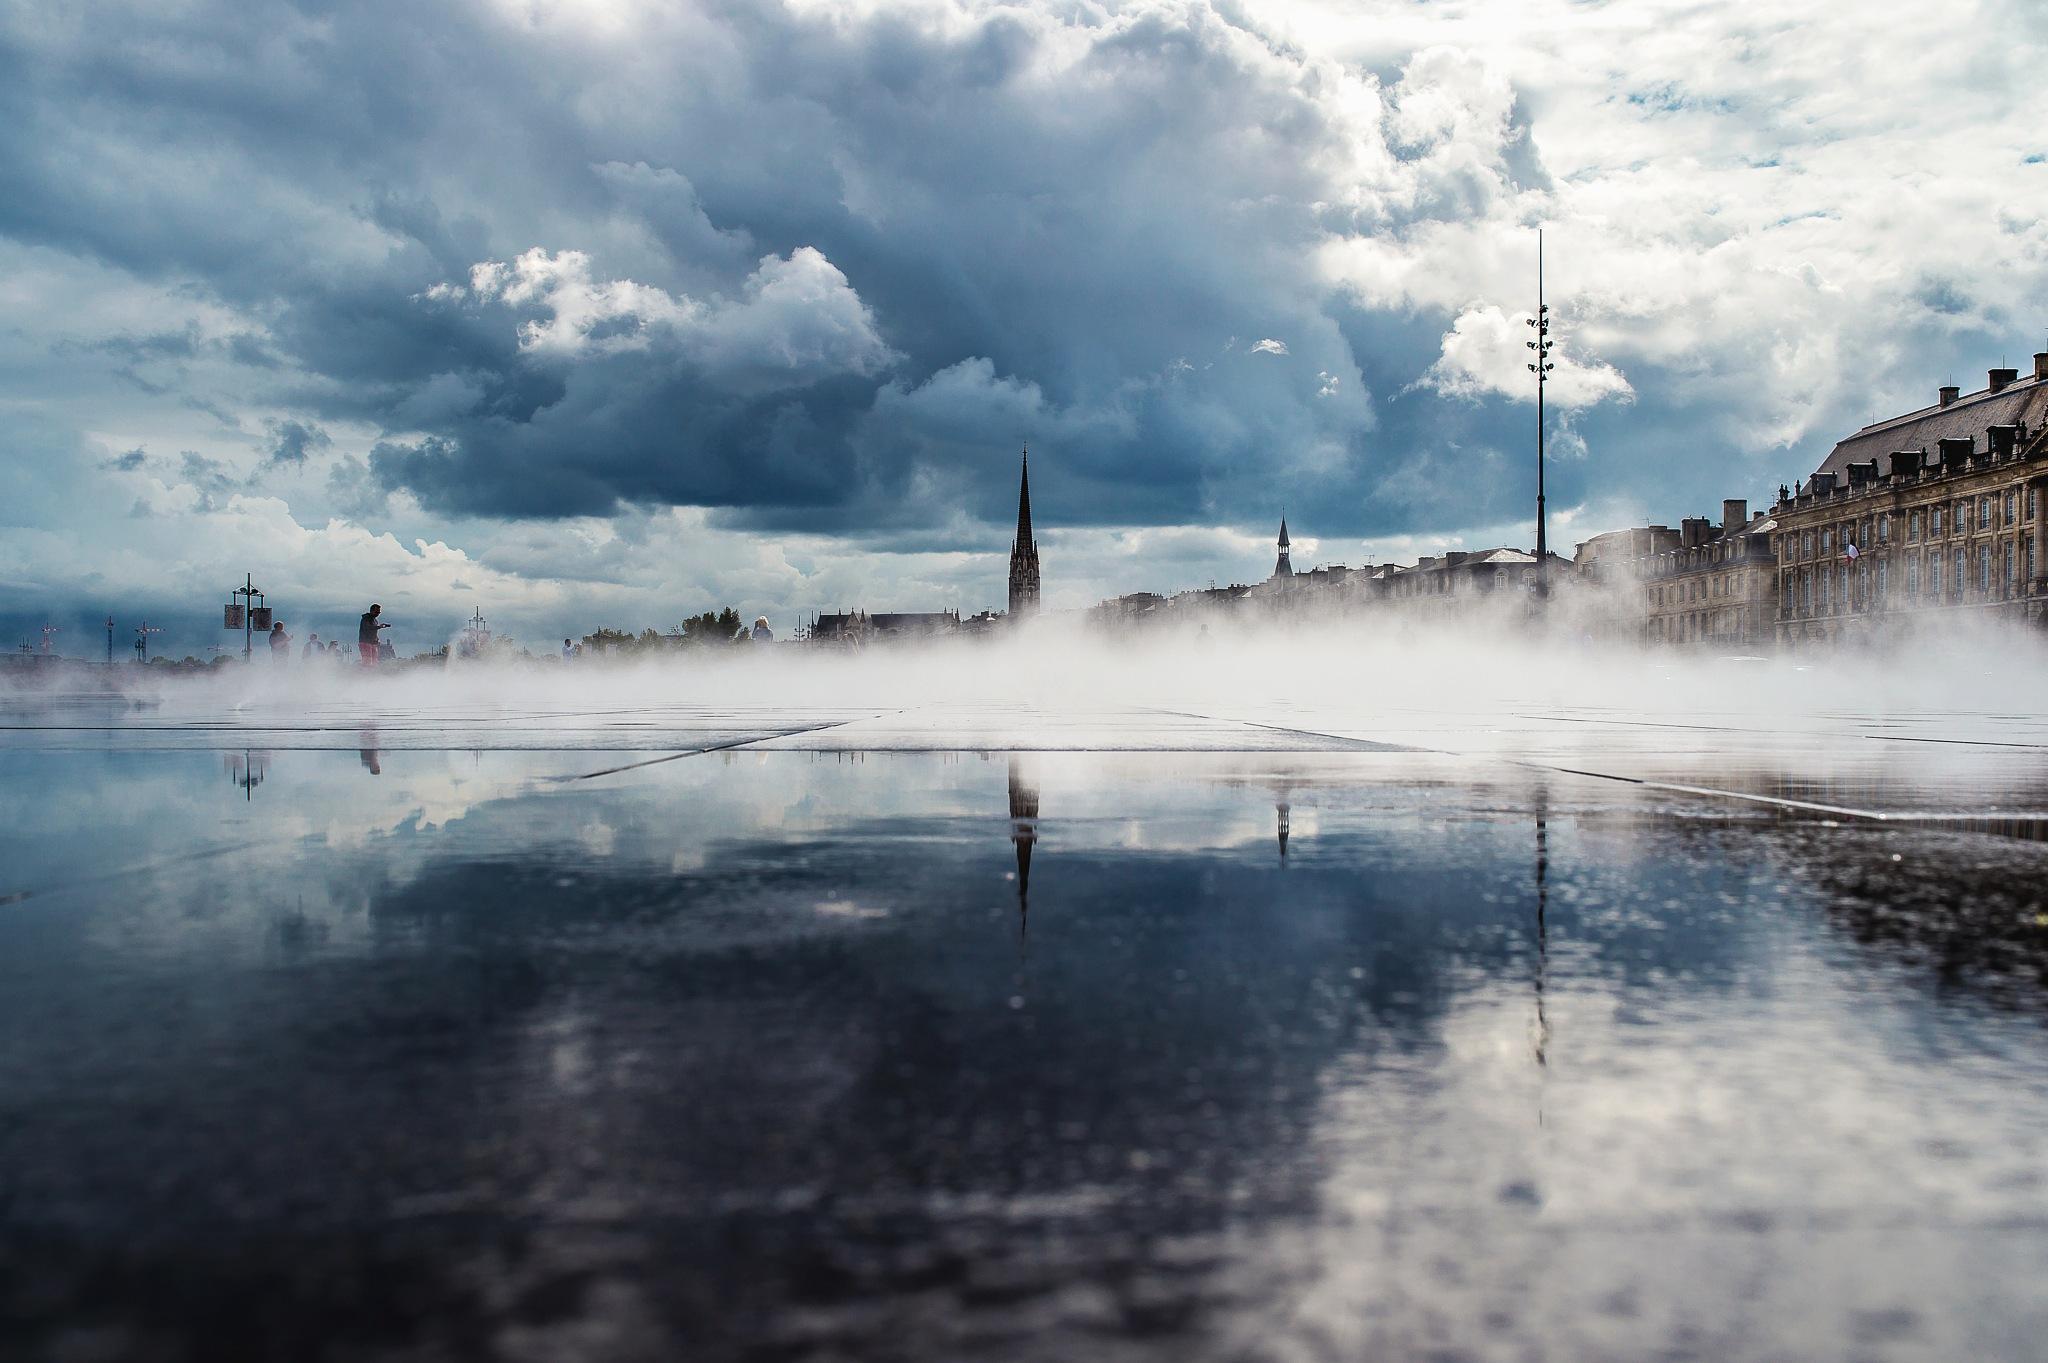 Miroir d'eau by Yann Texier